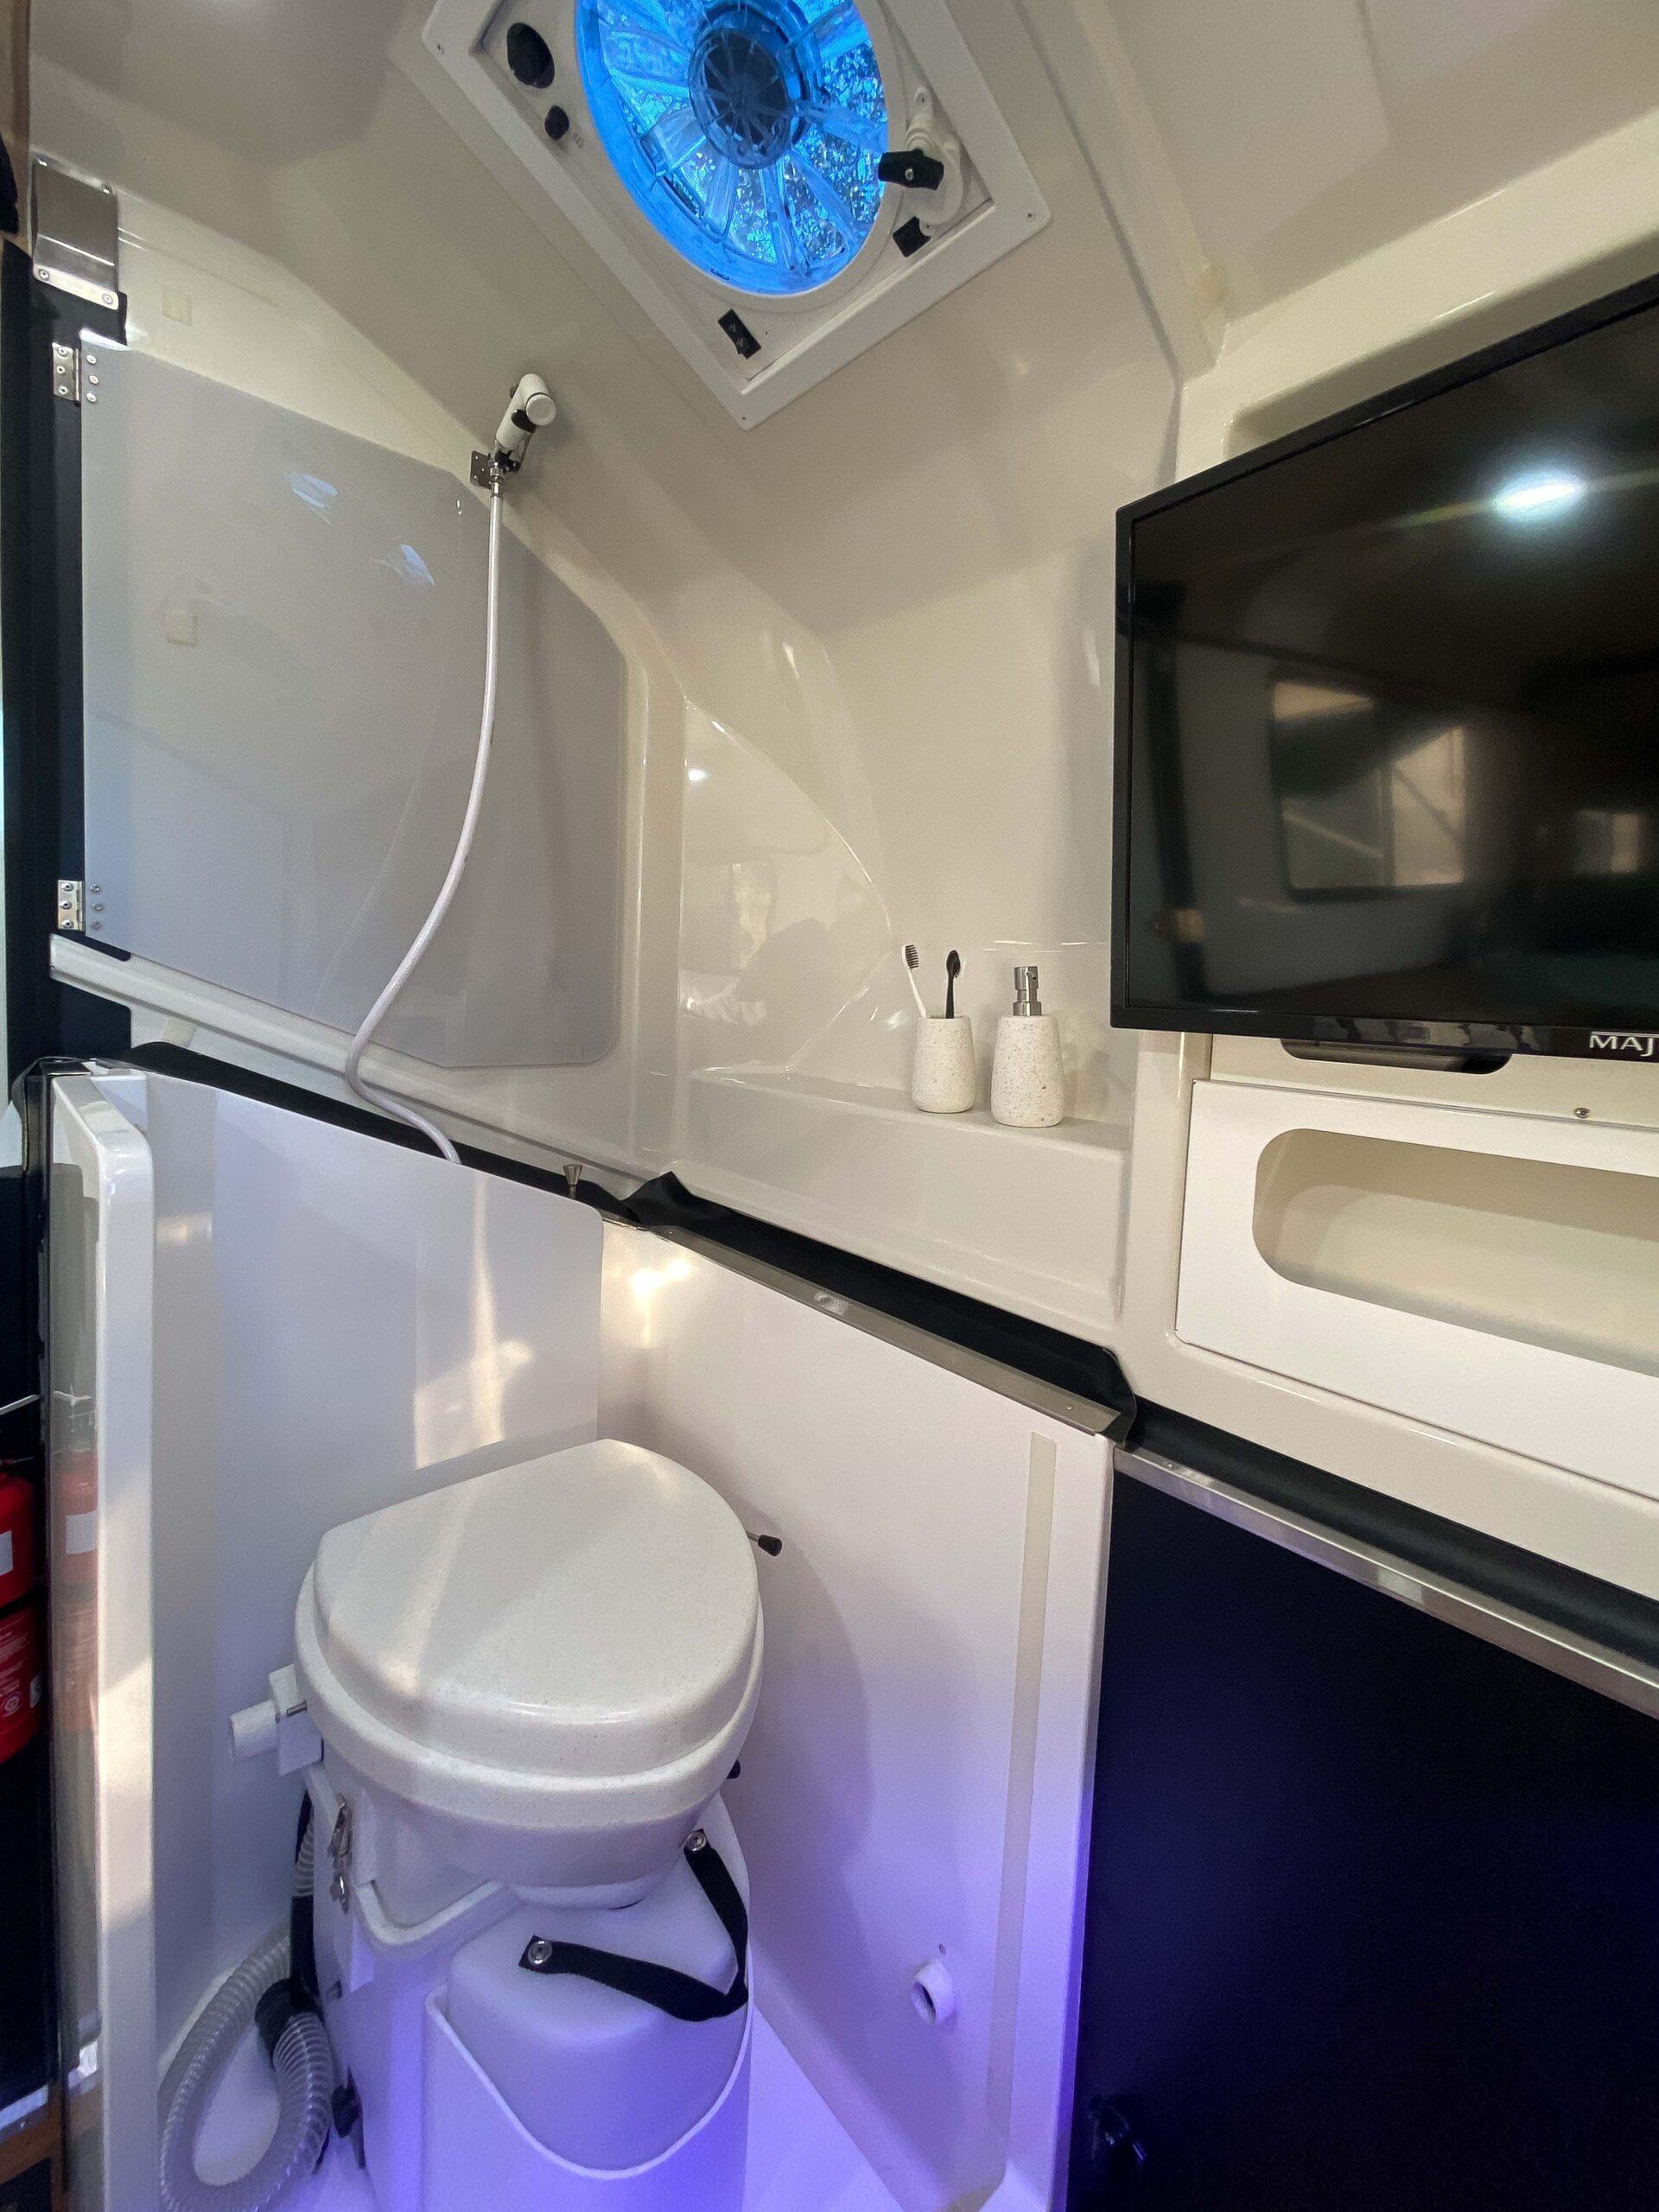 Kimberley Karavan shower and toilet